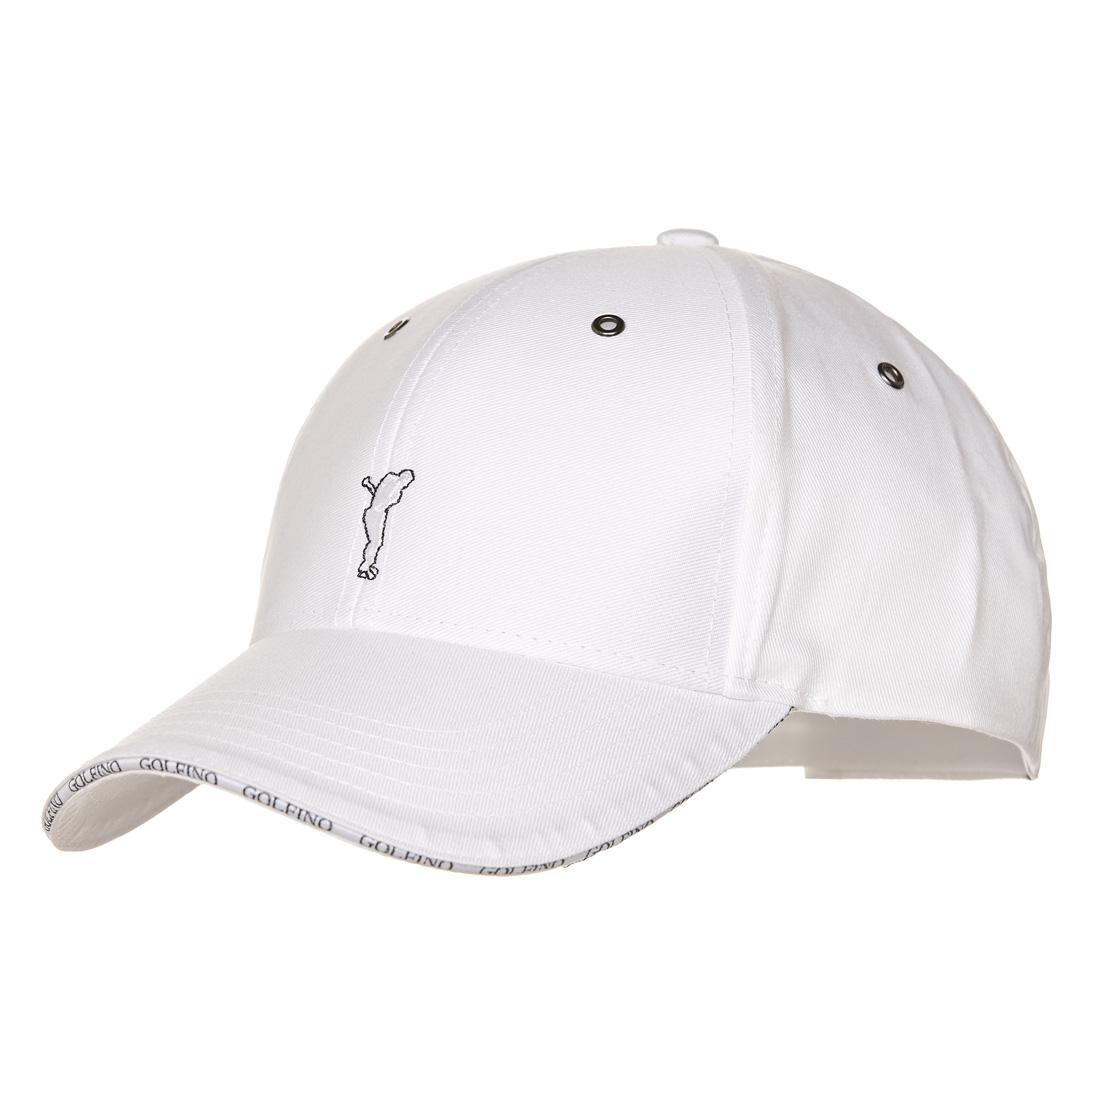 Herren Baumwoll-Golfcap